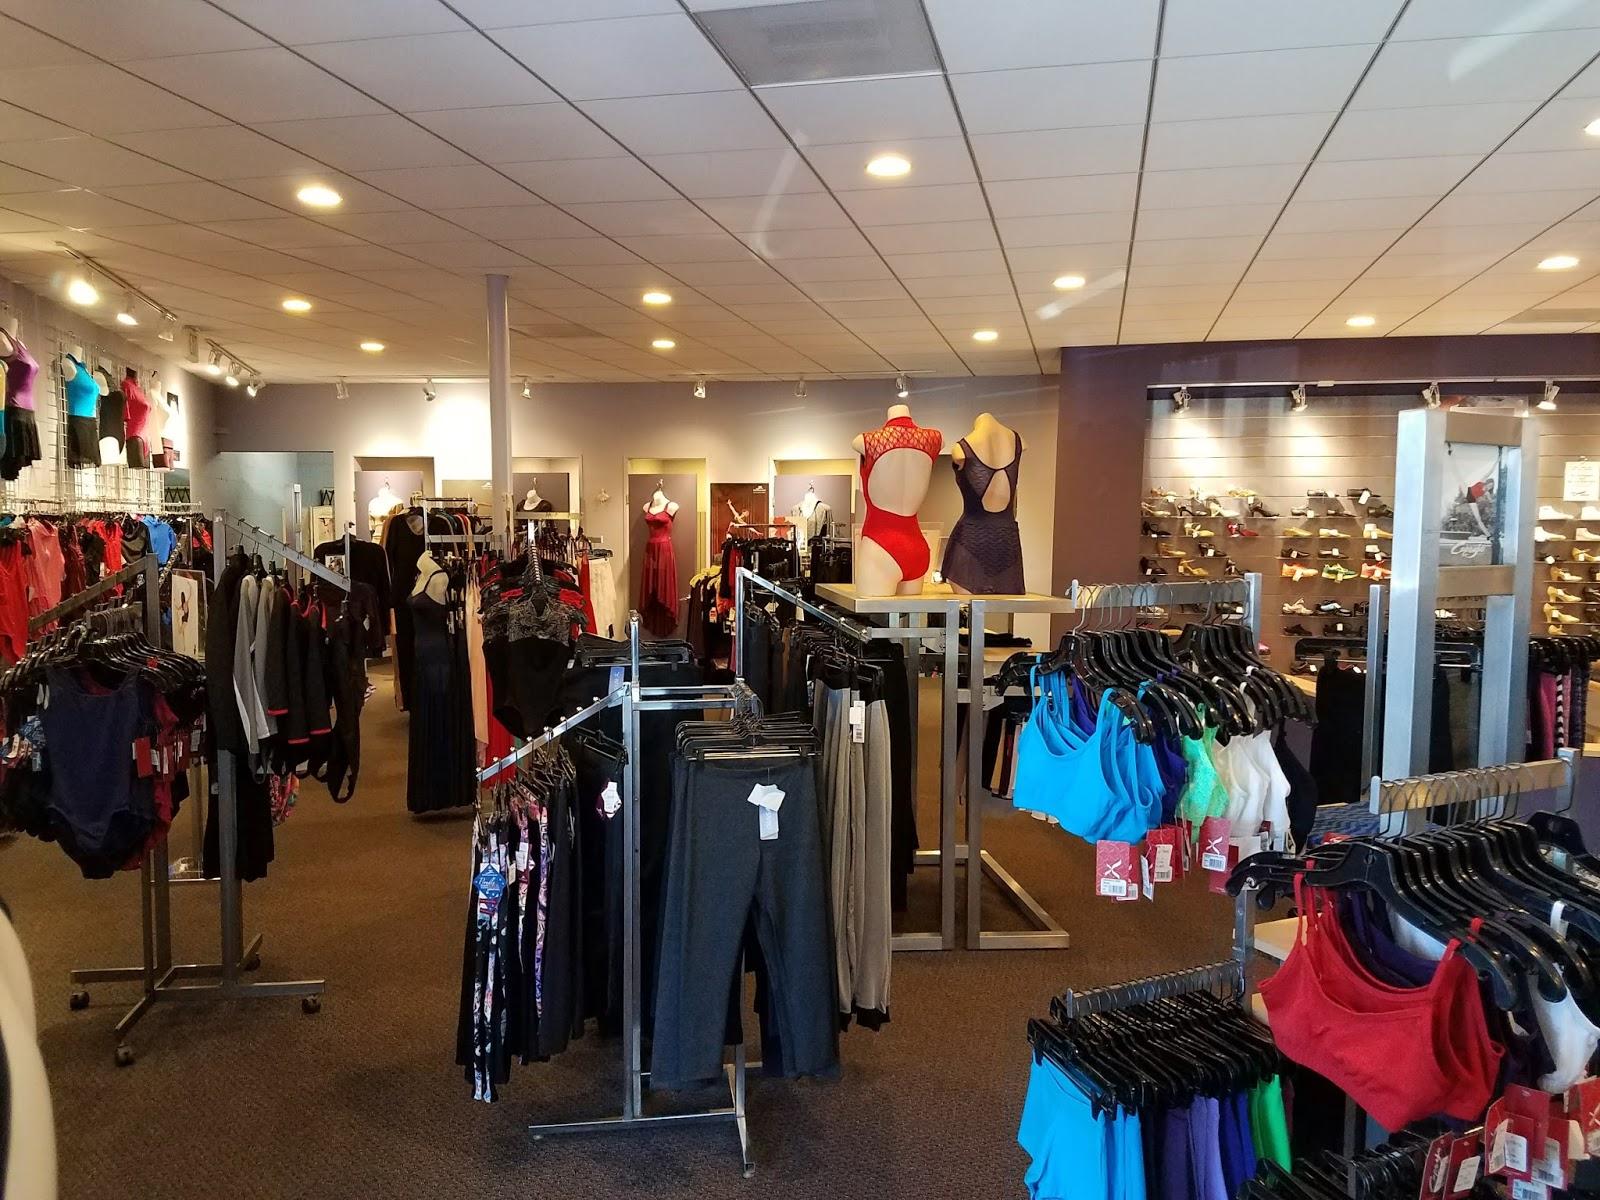 Balet Shoes Store In Pasadena Ca